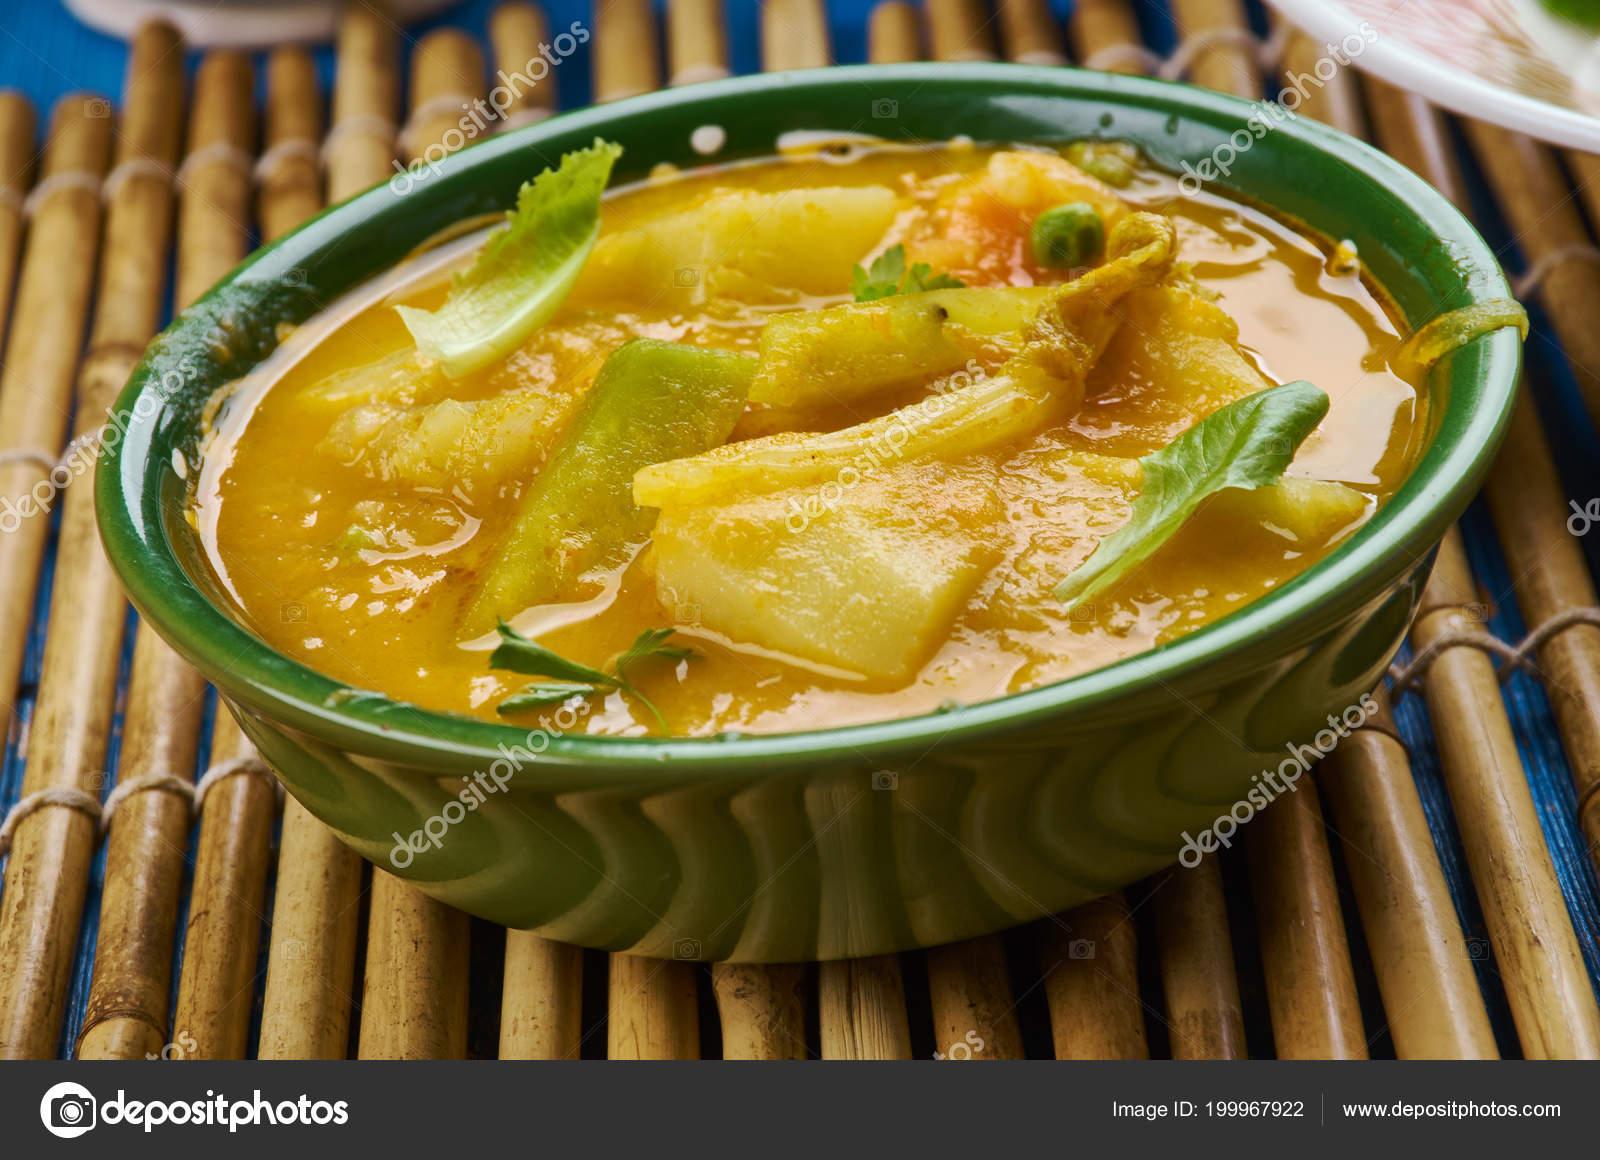 Pakistanische Küche | Bengali Drumstick Curry Drumstick Kartoffel Curry Pakistanische